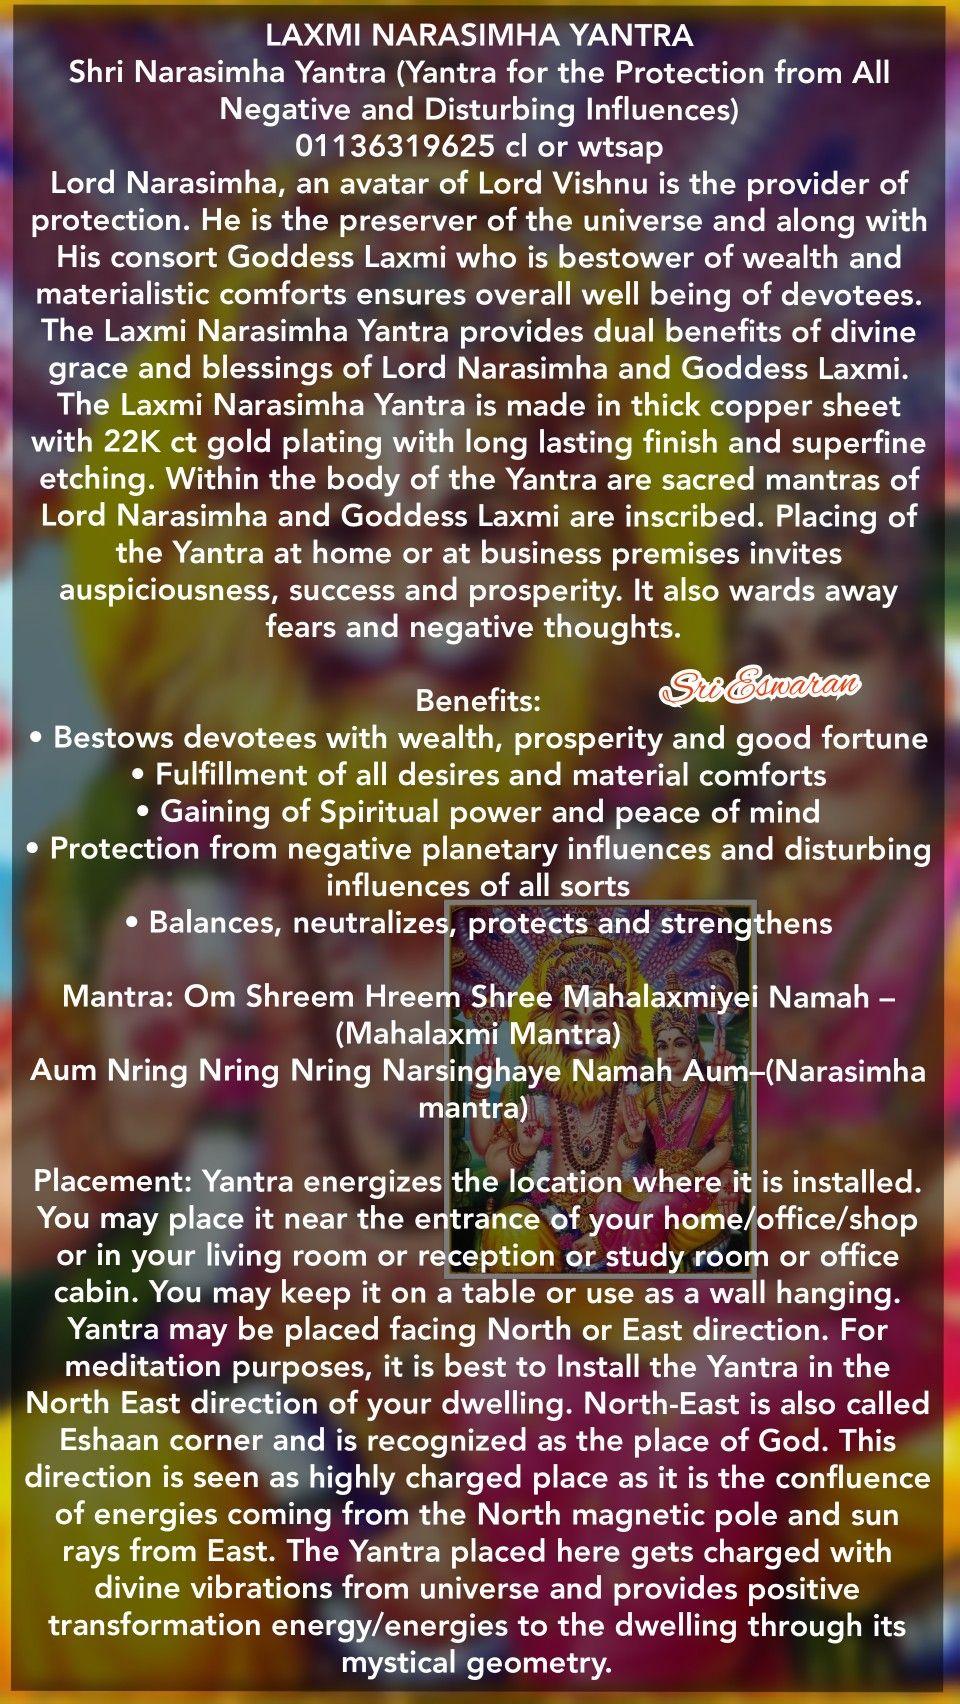 LAXMI NARASIMHA YANTRA Shri Narasimha Yantra (Yantra for the